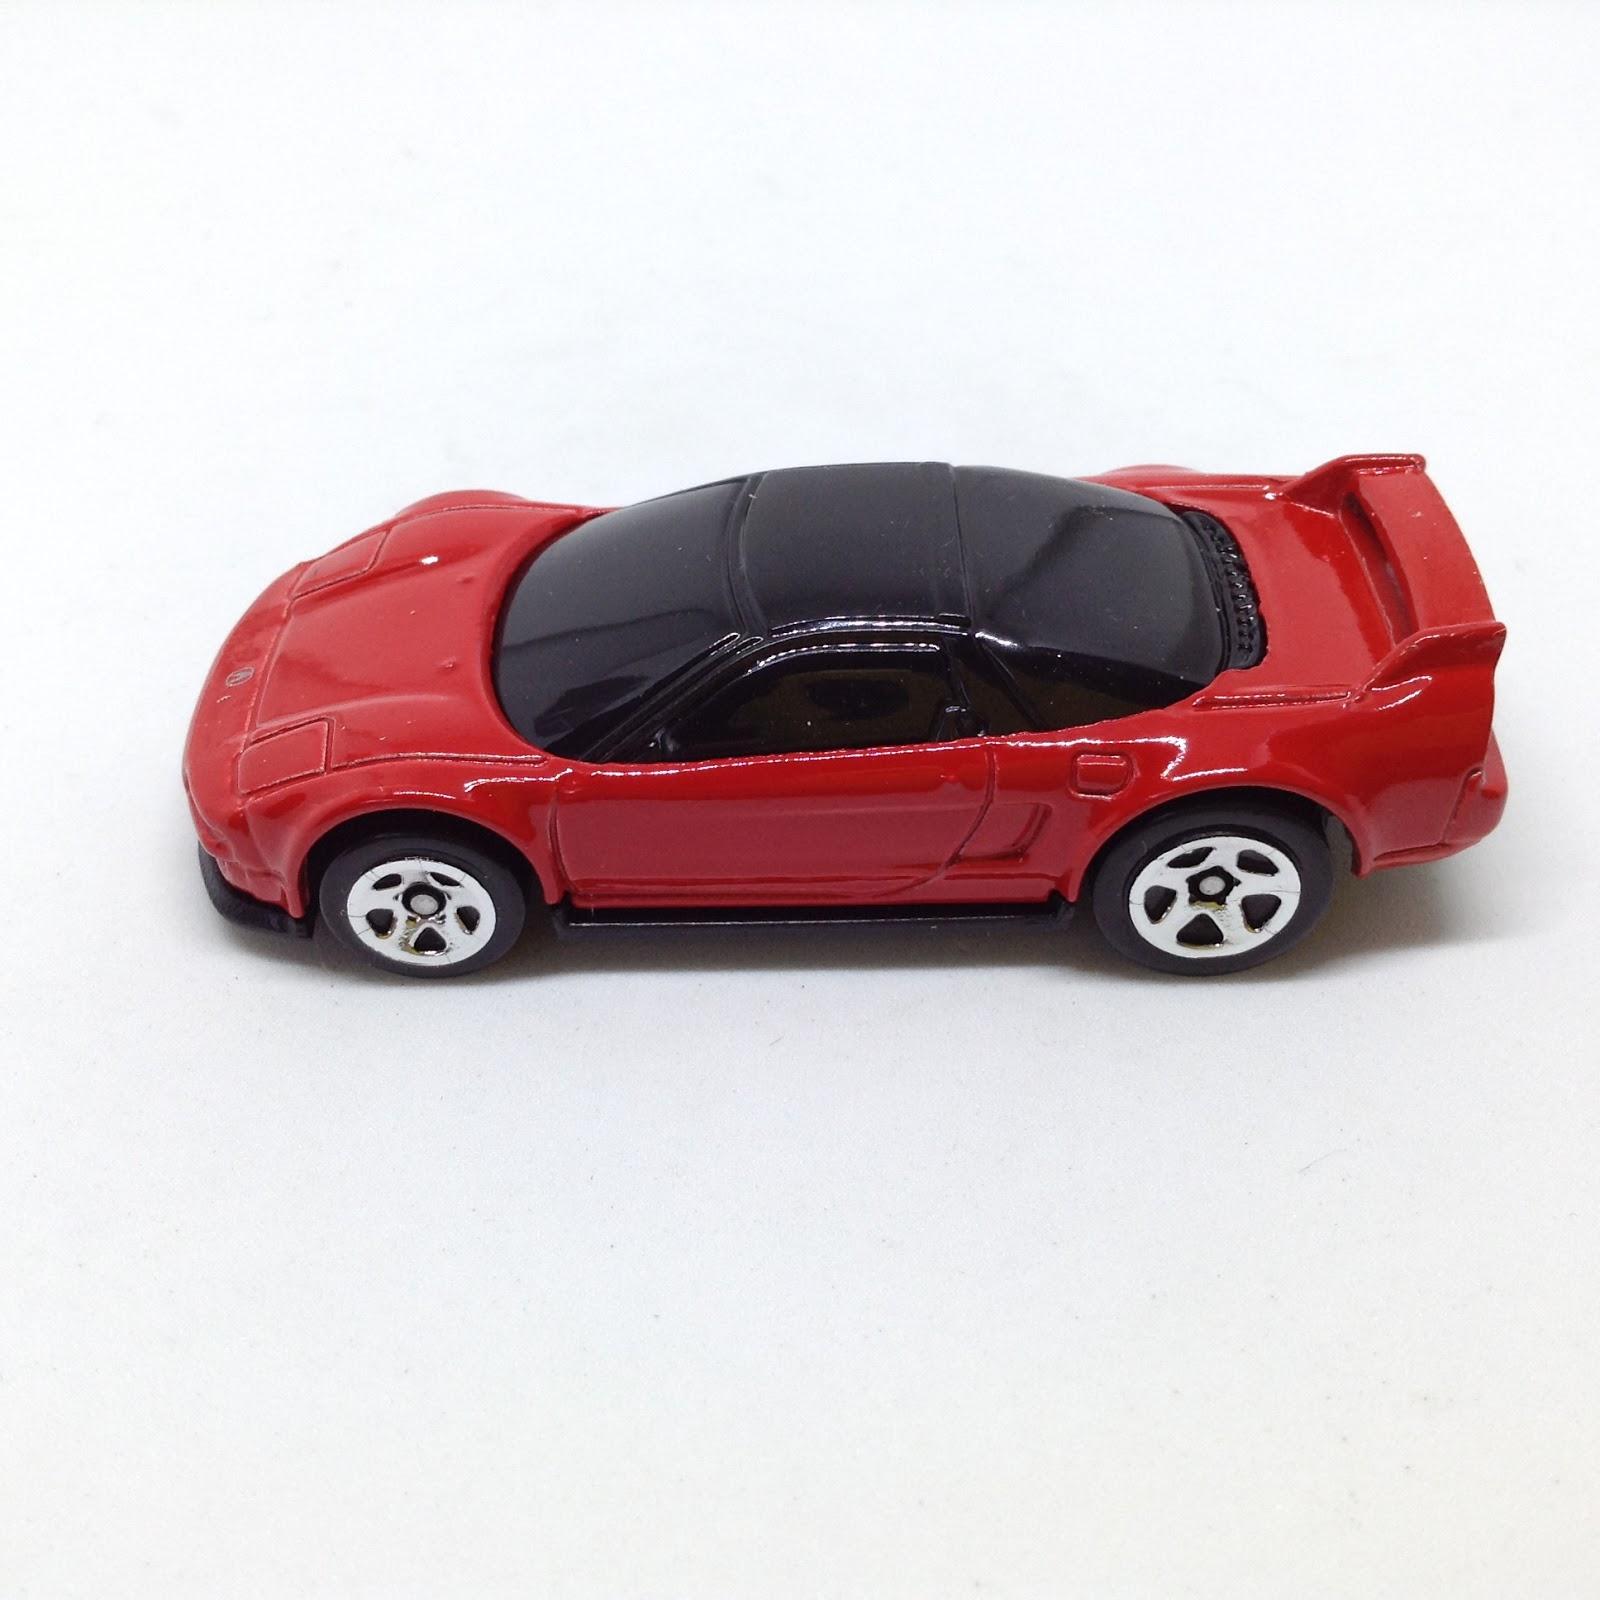 Julian's Hot Wheels Blog: 1990 Acura NSX (2018 Target